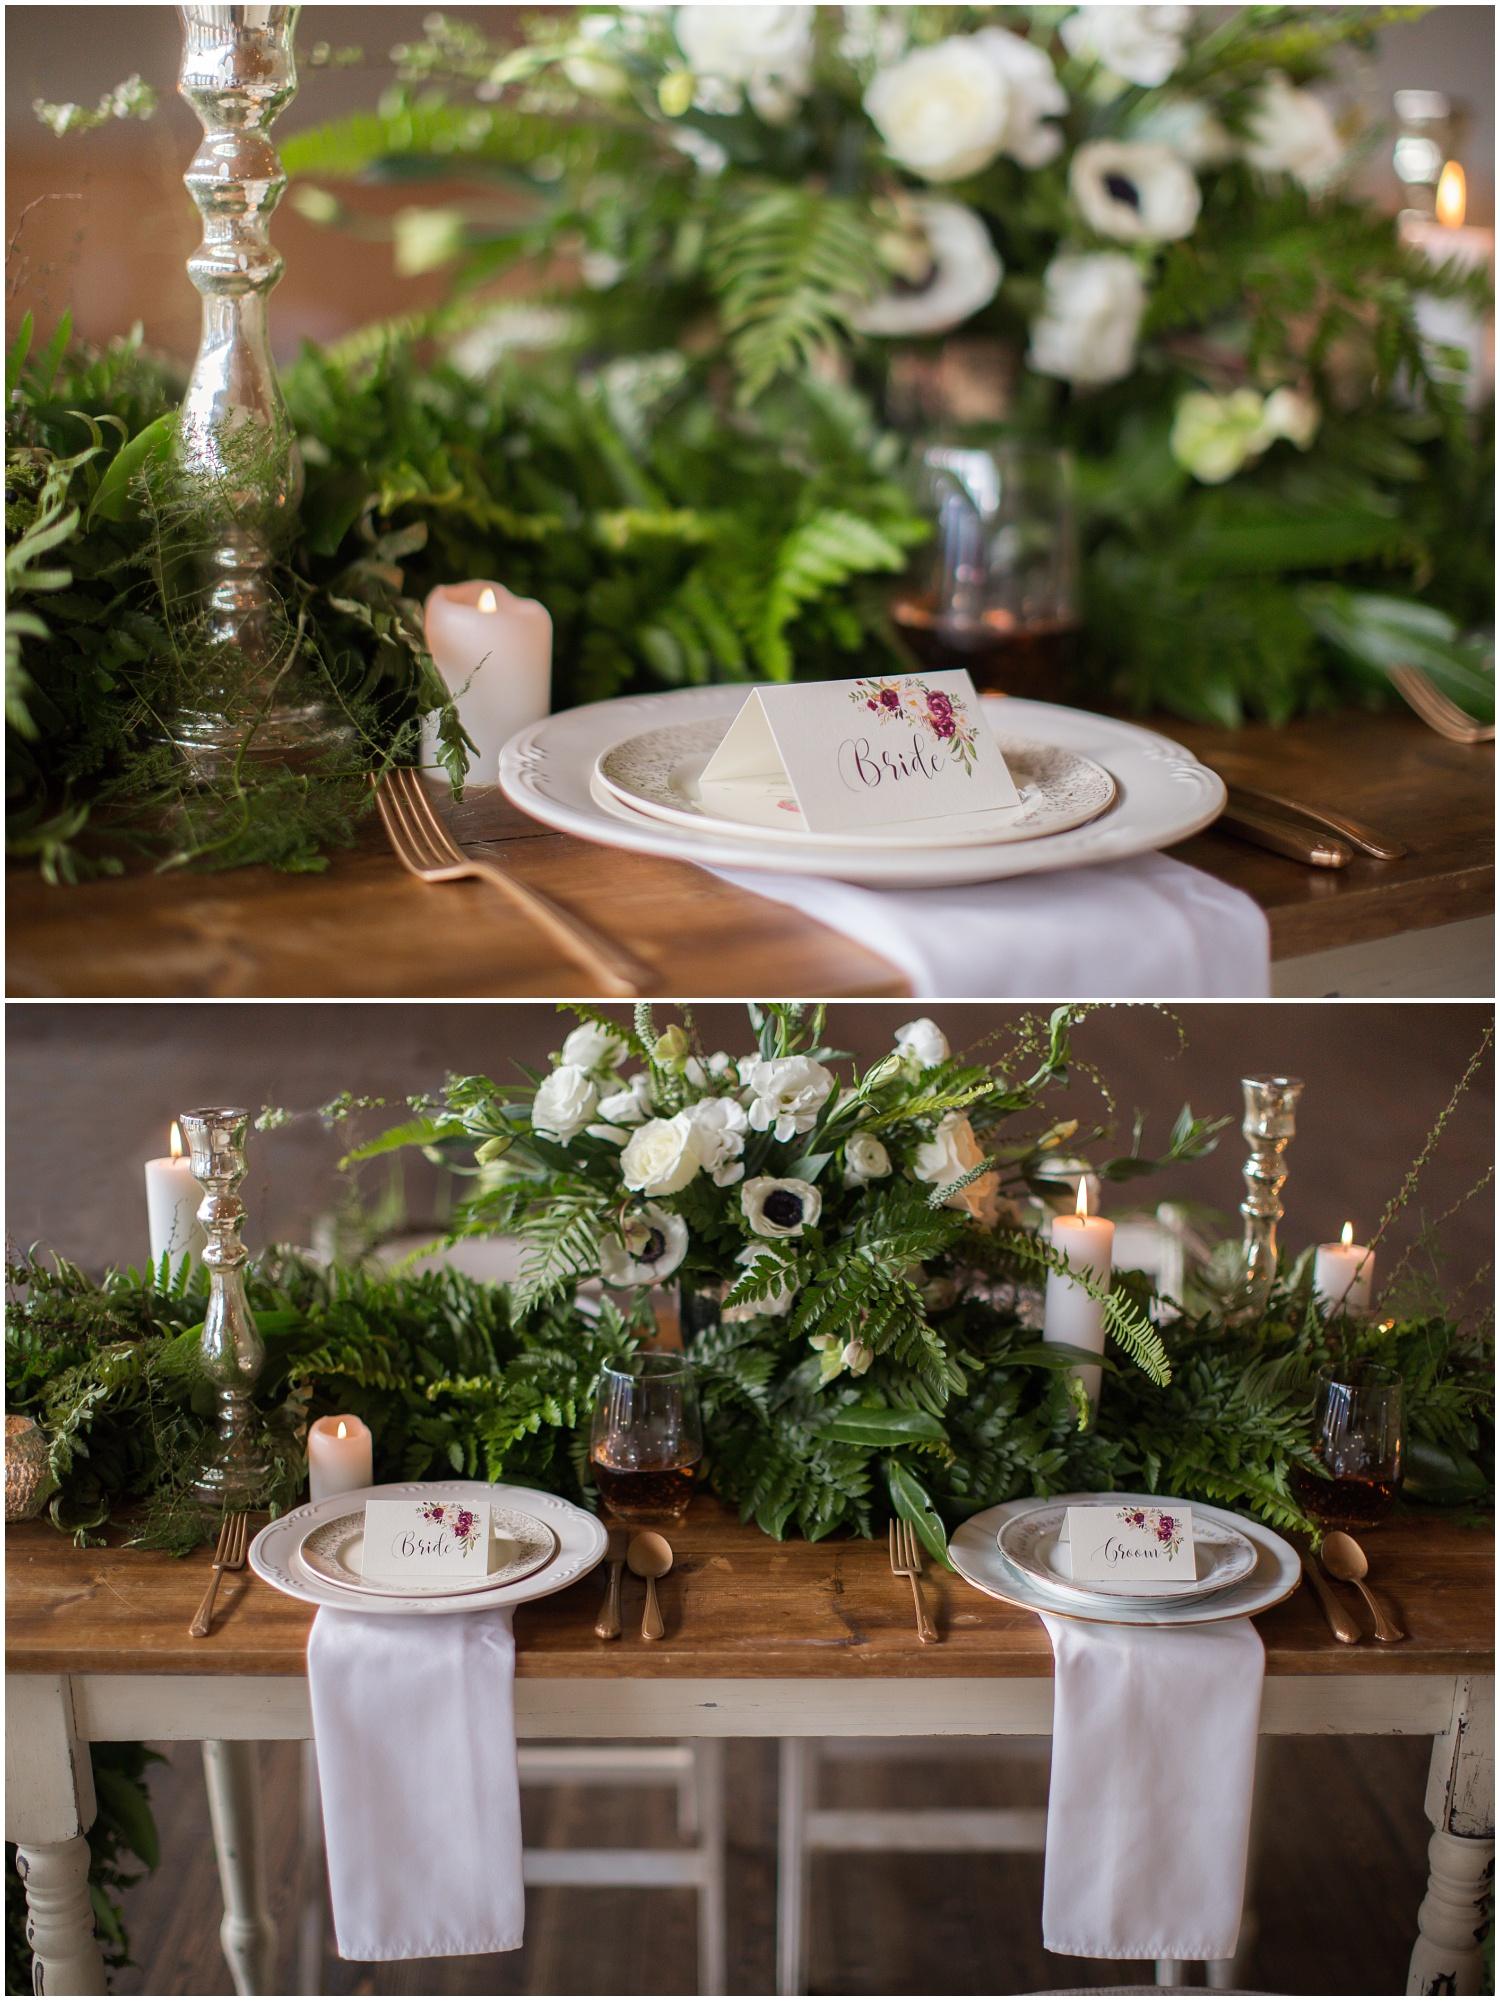 Amazing Day Photography - Fraser River Lodge Styled Session - Woodland Wedding - Green Tones - Green and White Wedding - Blush Wedding Dress - Morilee Wedding Dress - BC Wedding (16).jpg